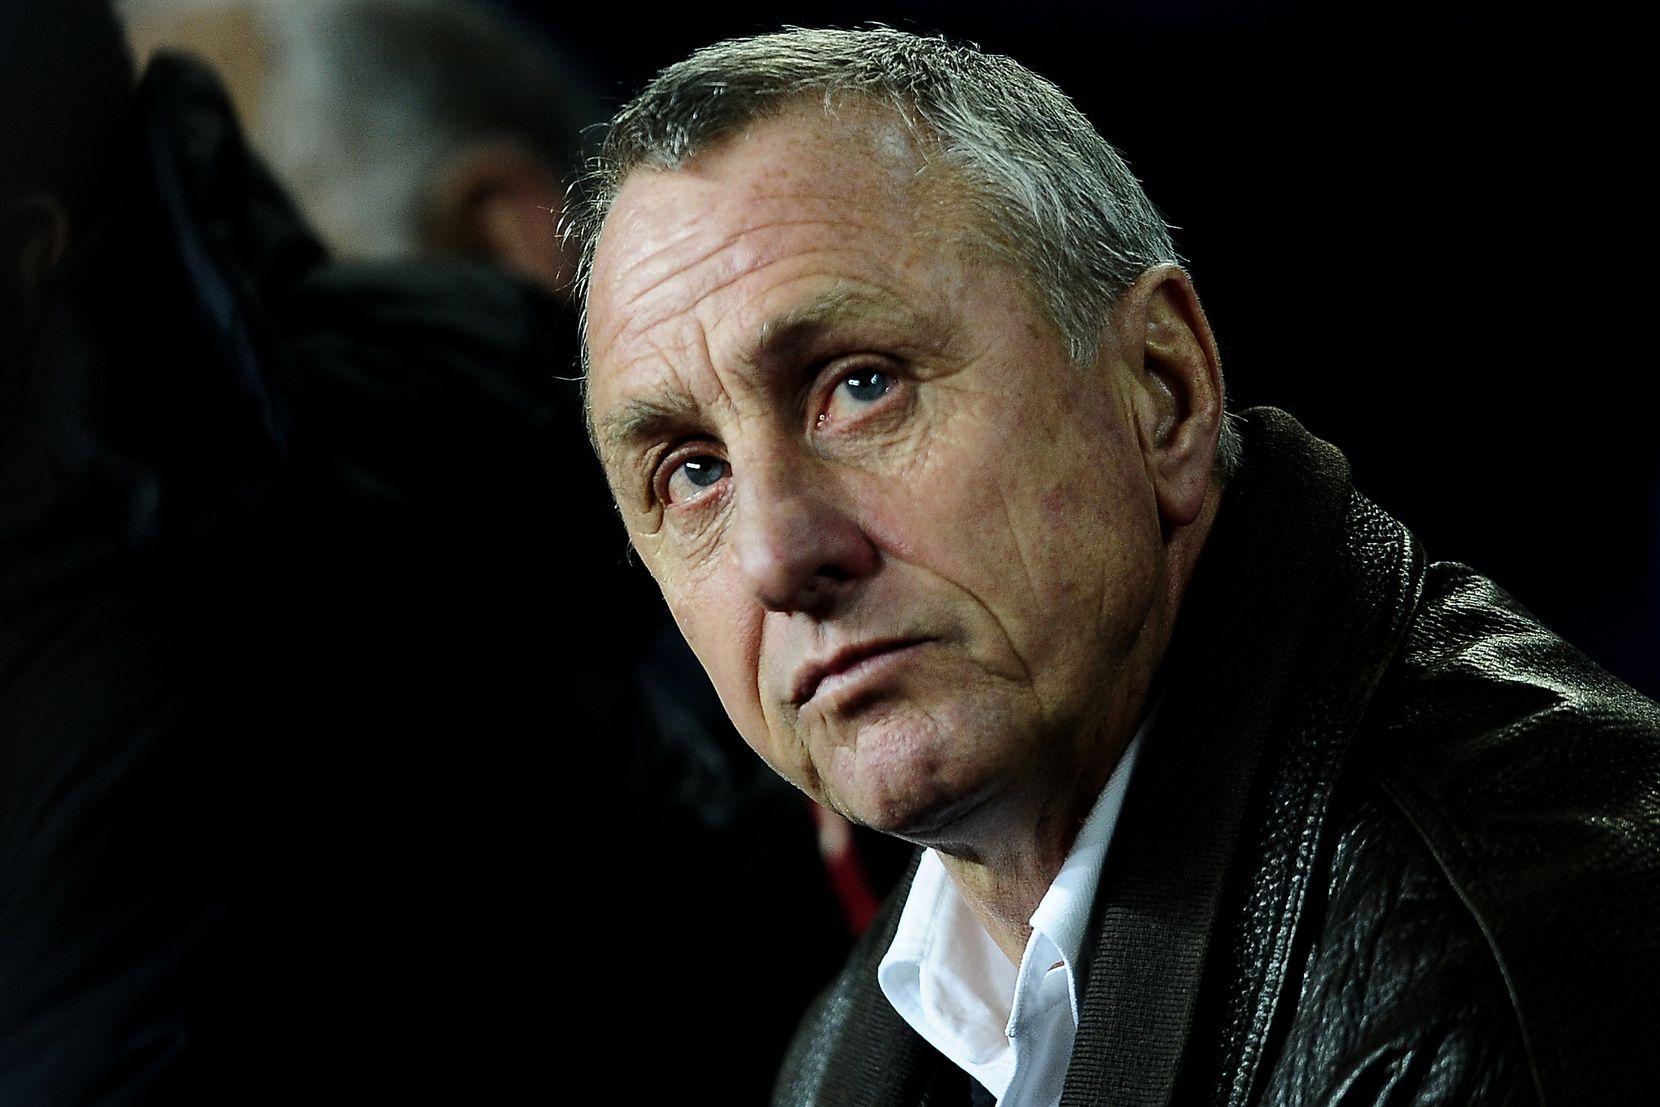 Johan Cruyff en 2009. (AP Photo/Manu Fernandez, File)